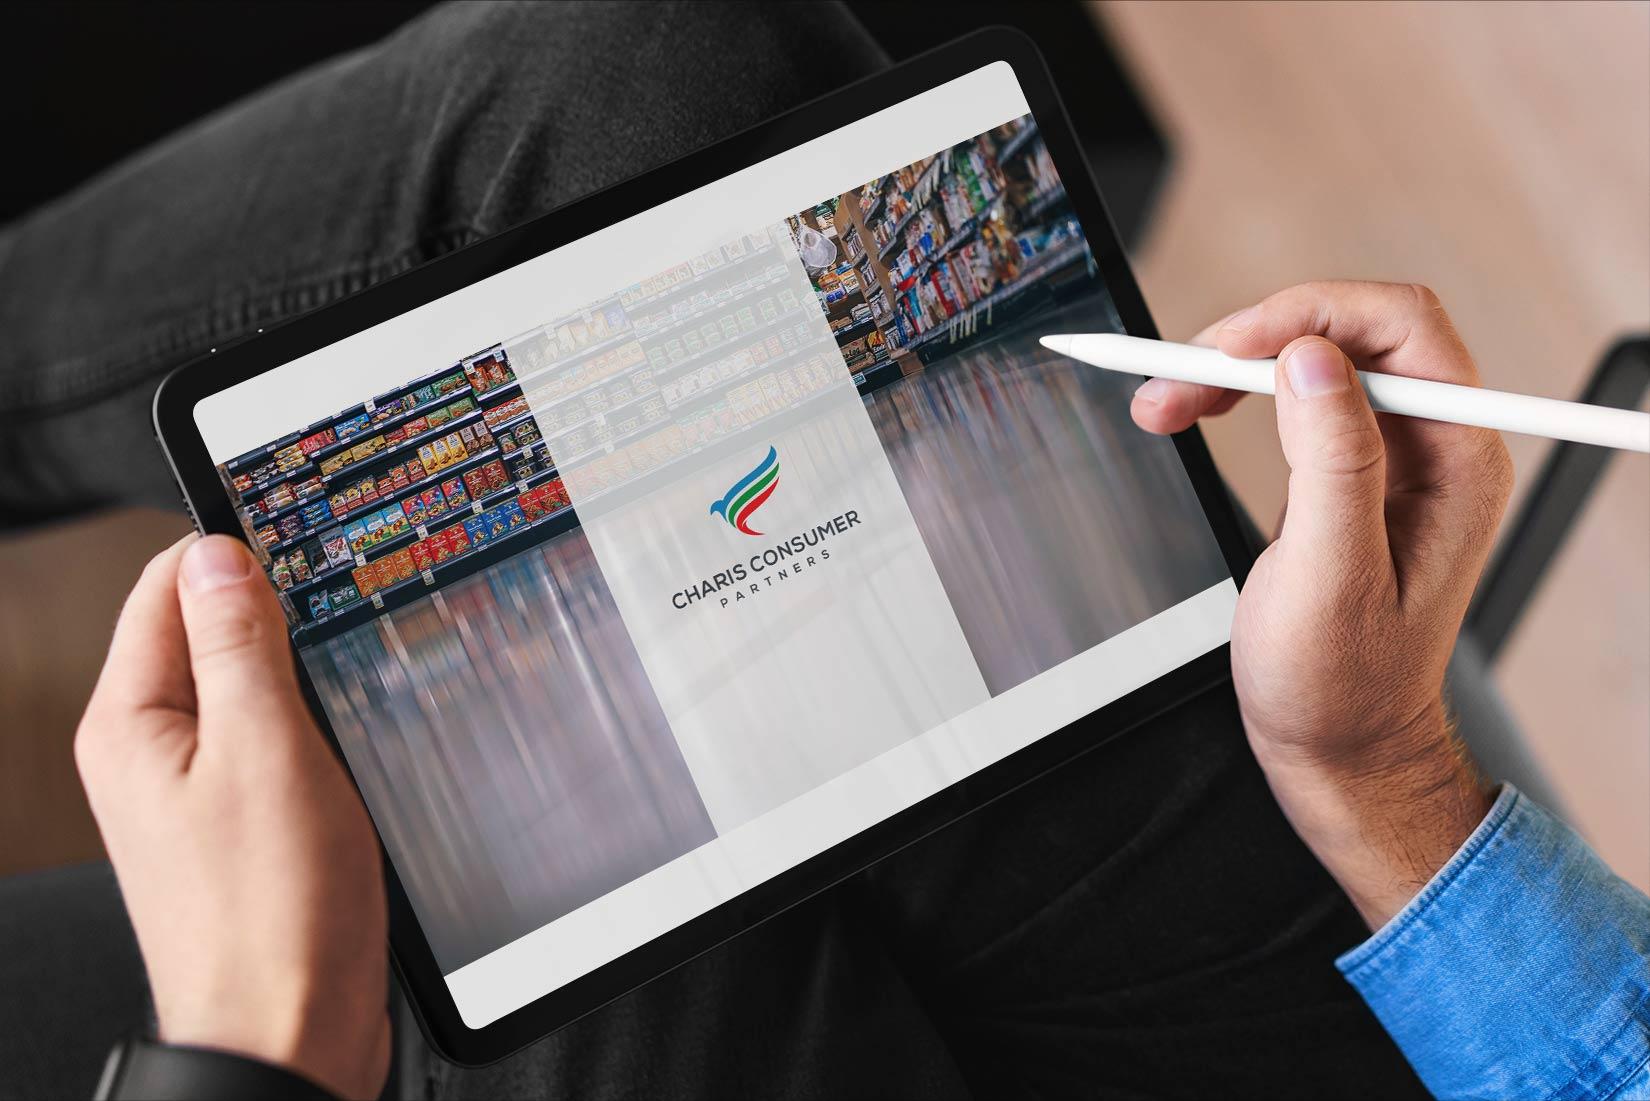 Charis Consumer Partners Powerpoint